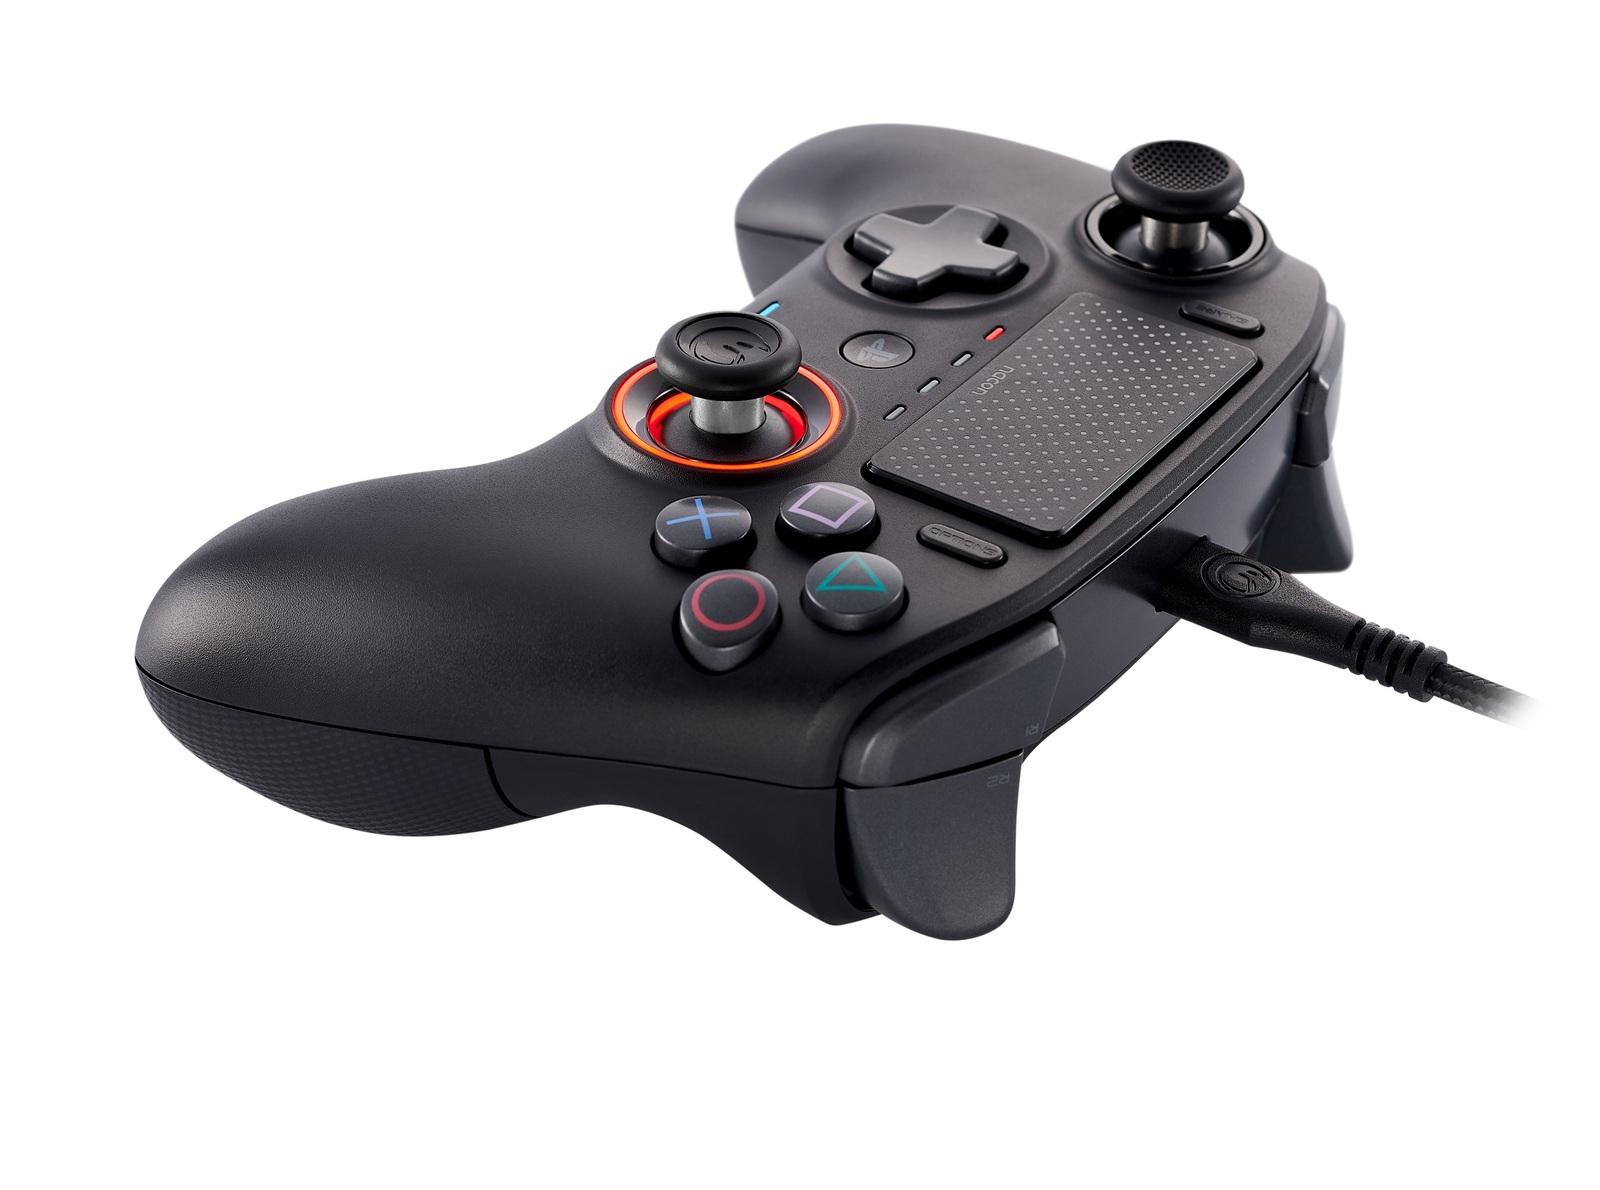 Nacon PS4 Revolution Pro Gaming Controller v3 for PS4 image